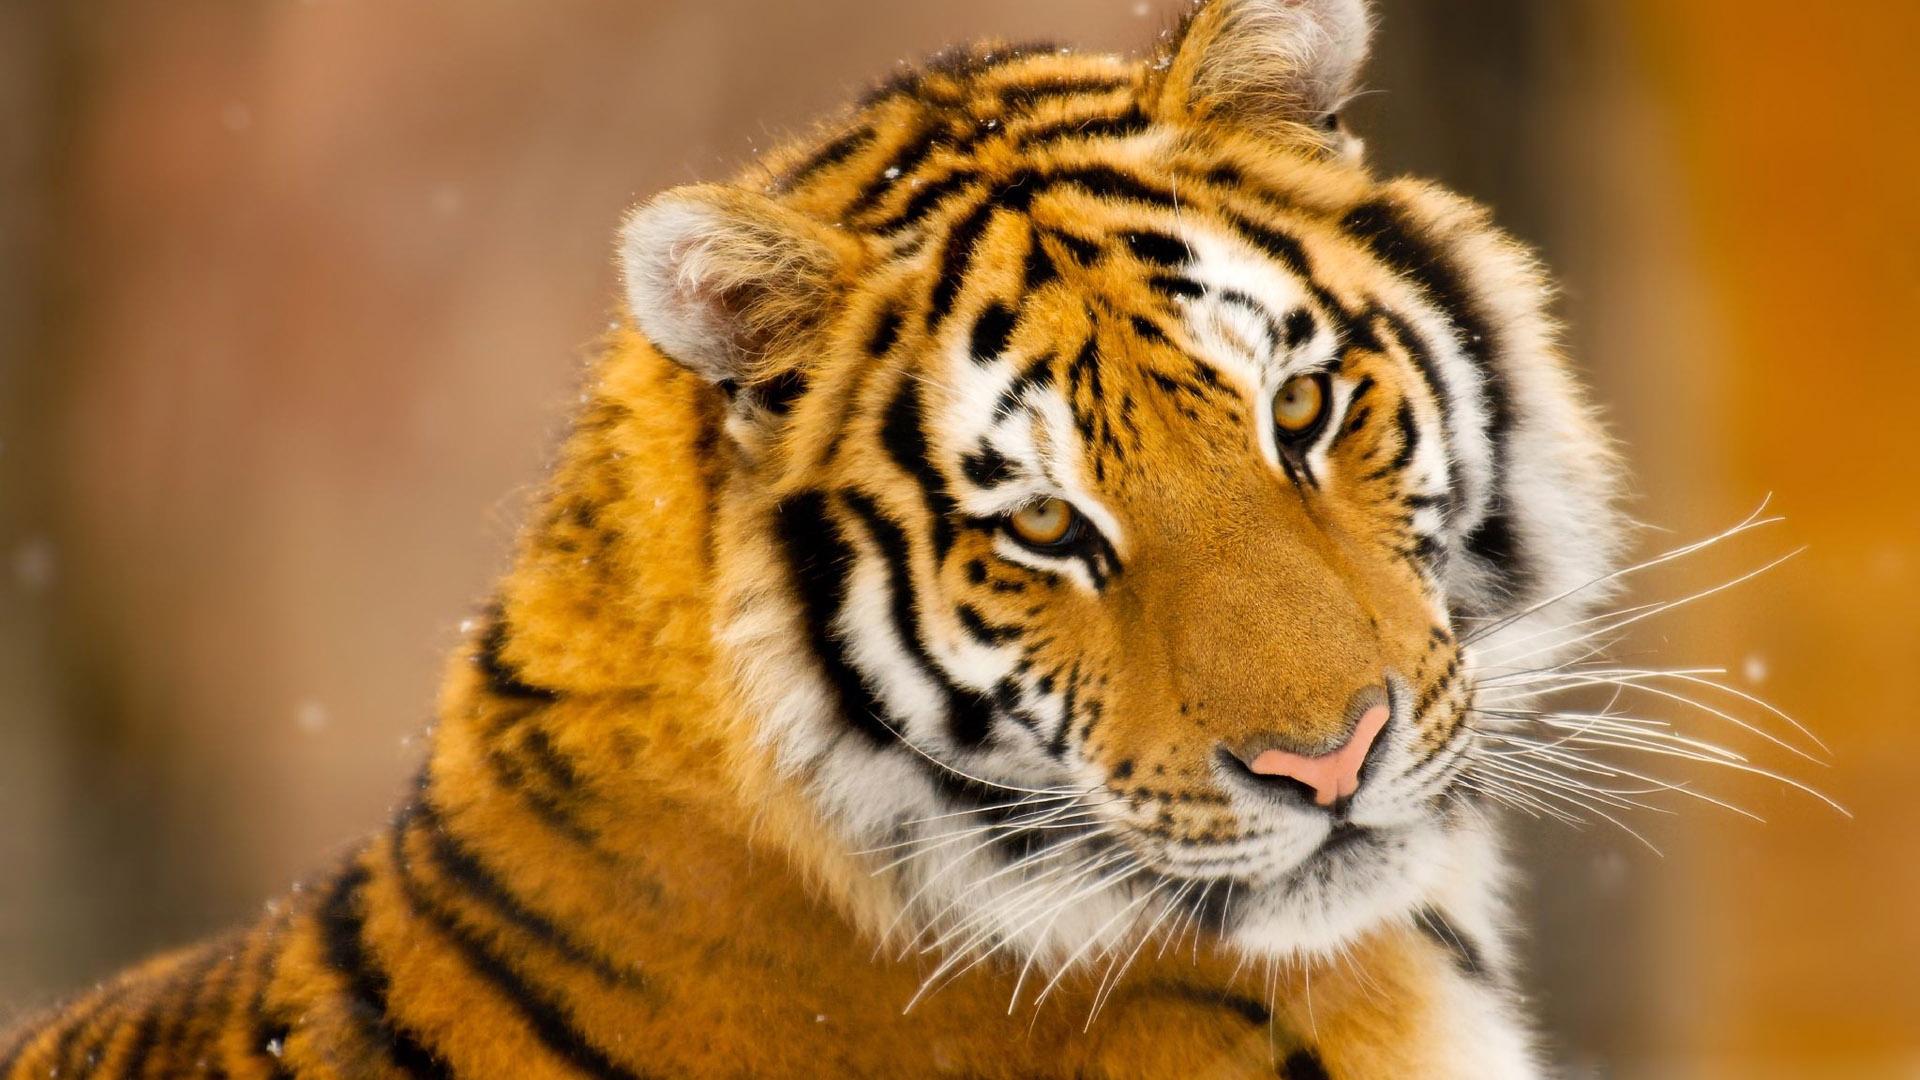 Cute Tiger Image 15047 Wallpaper High Resolution 1920x1080